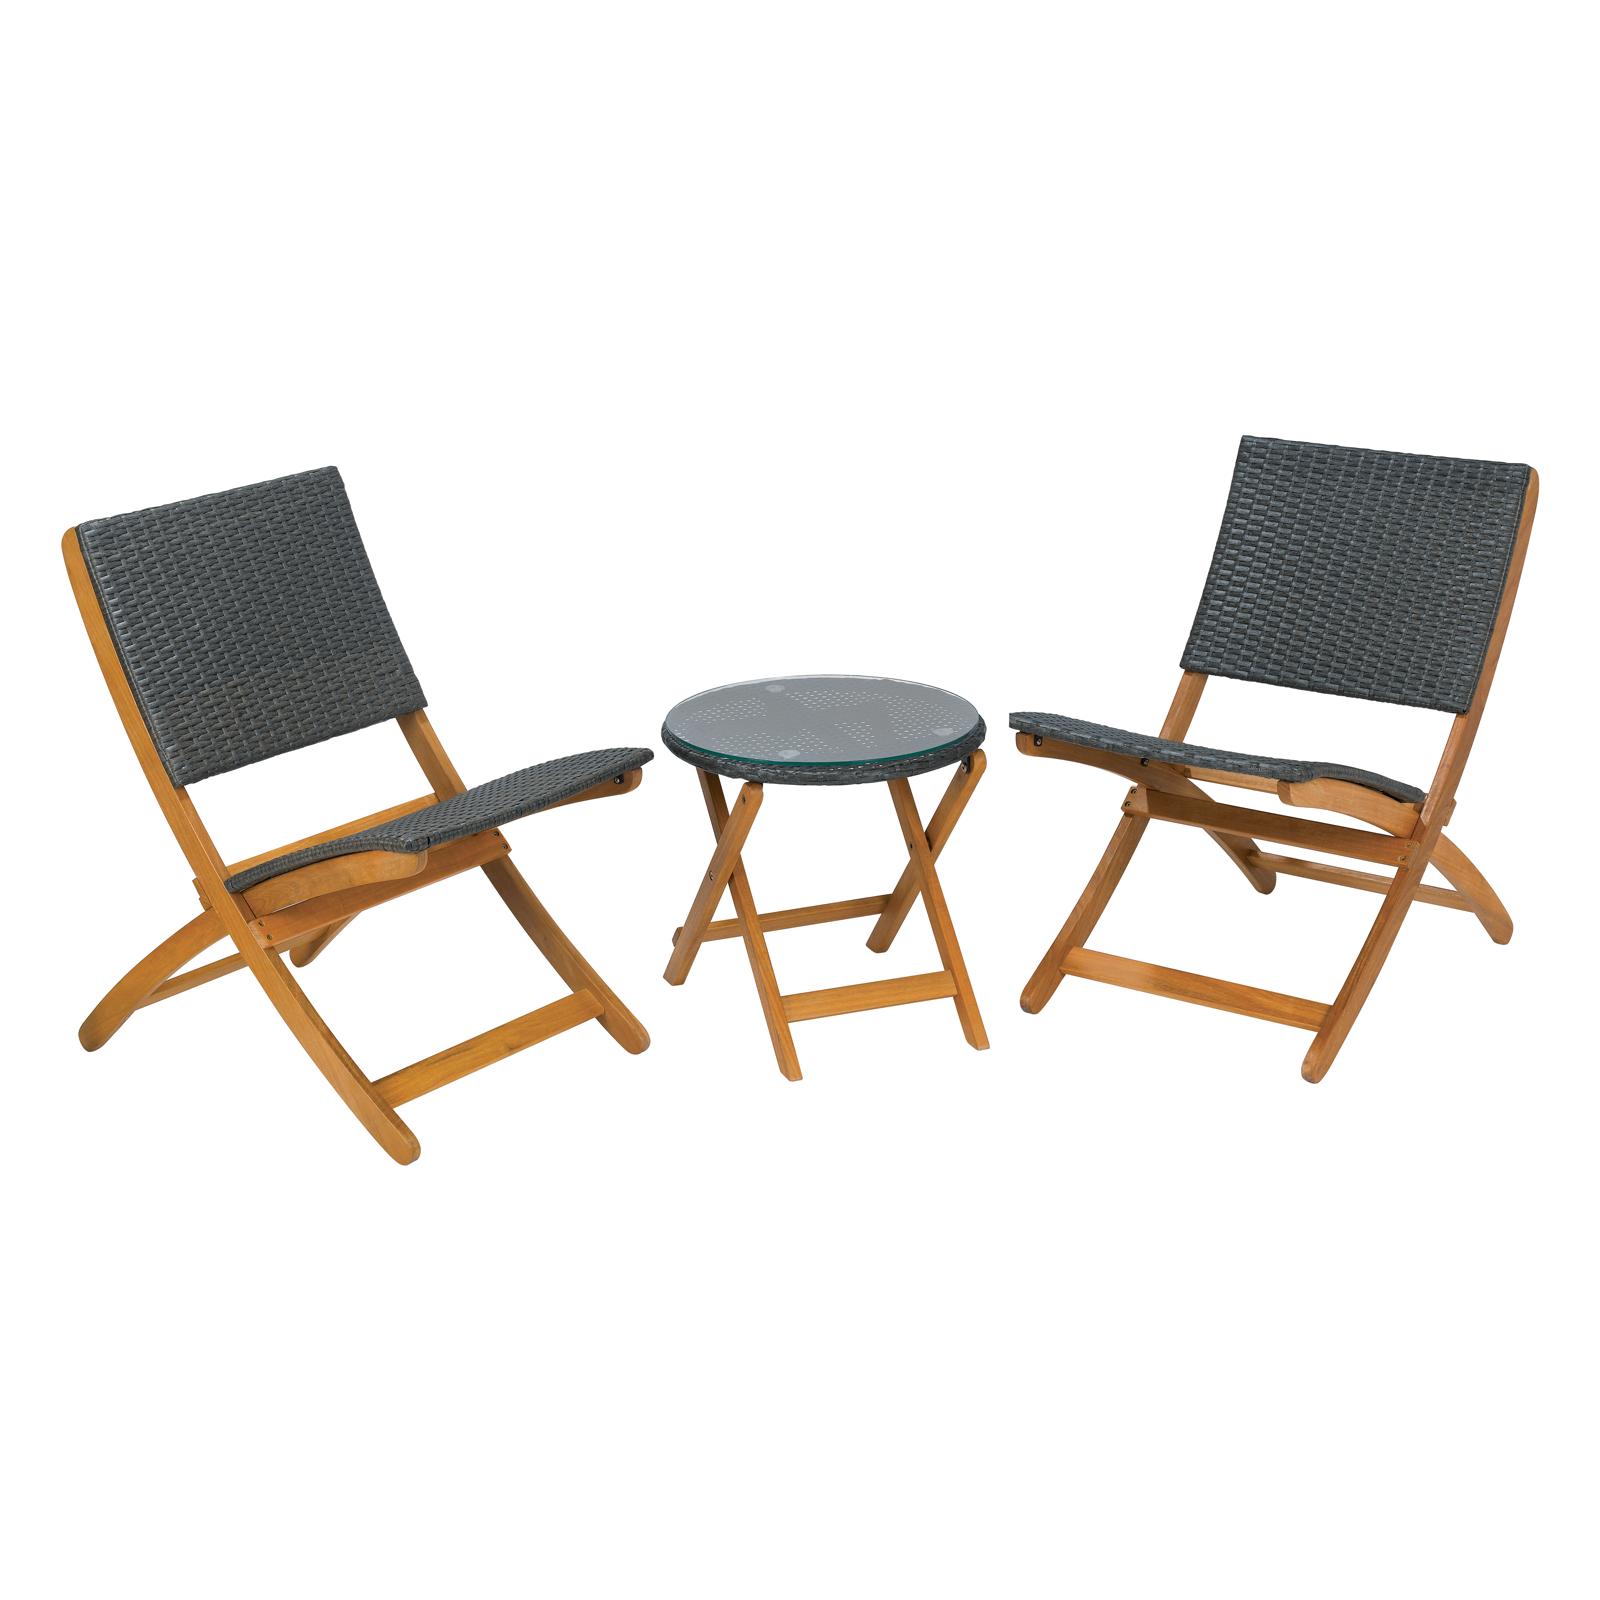 3 Piece Outdoor Furniture Bunnings